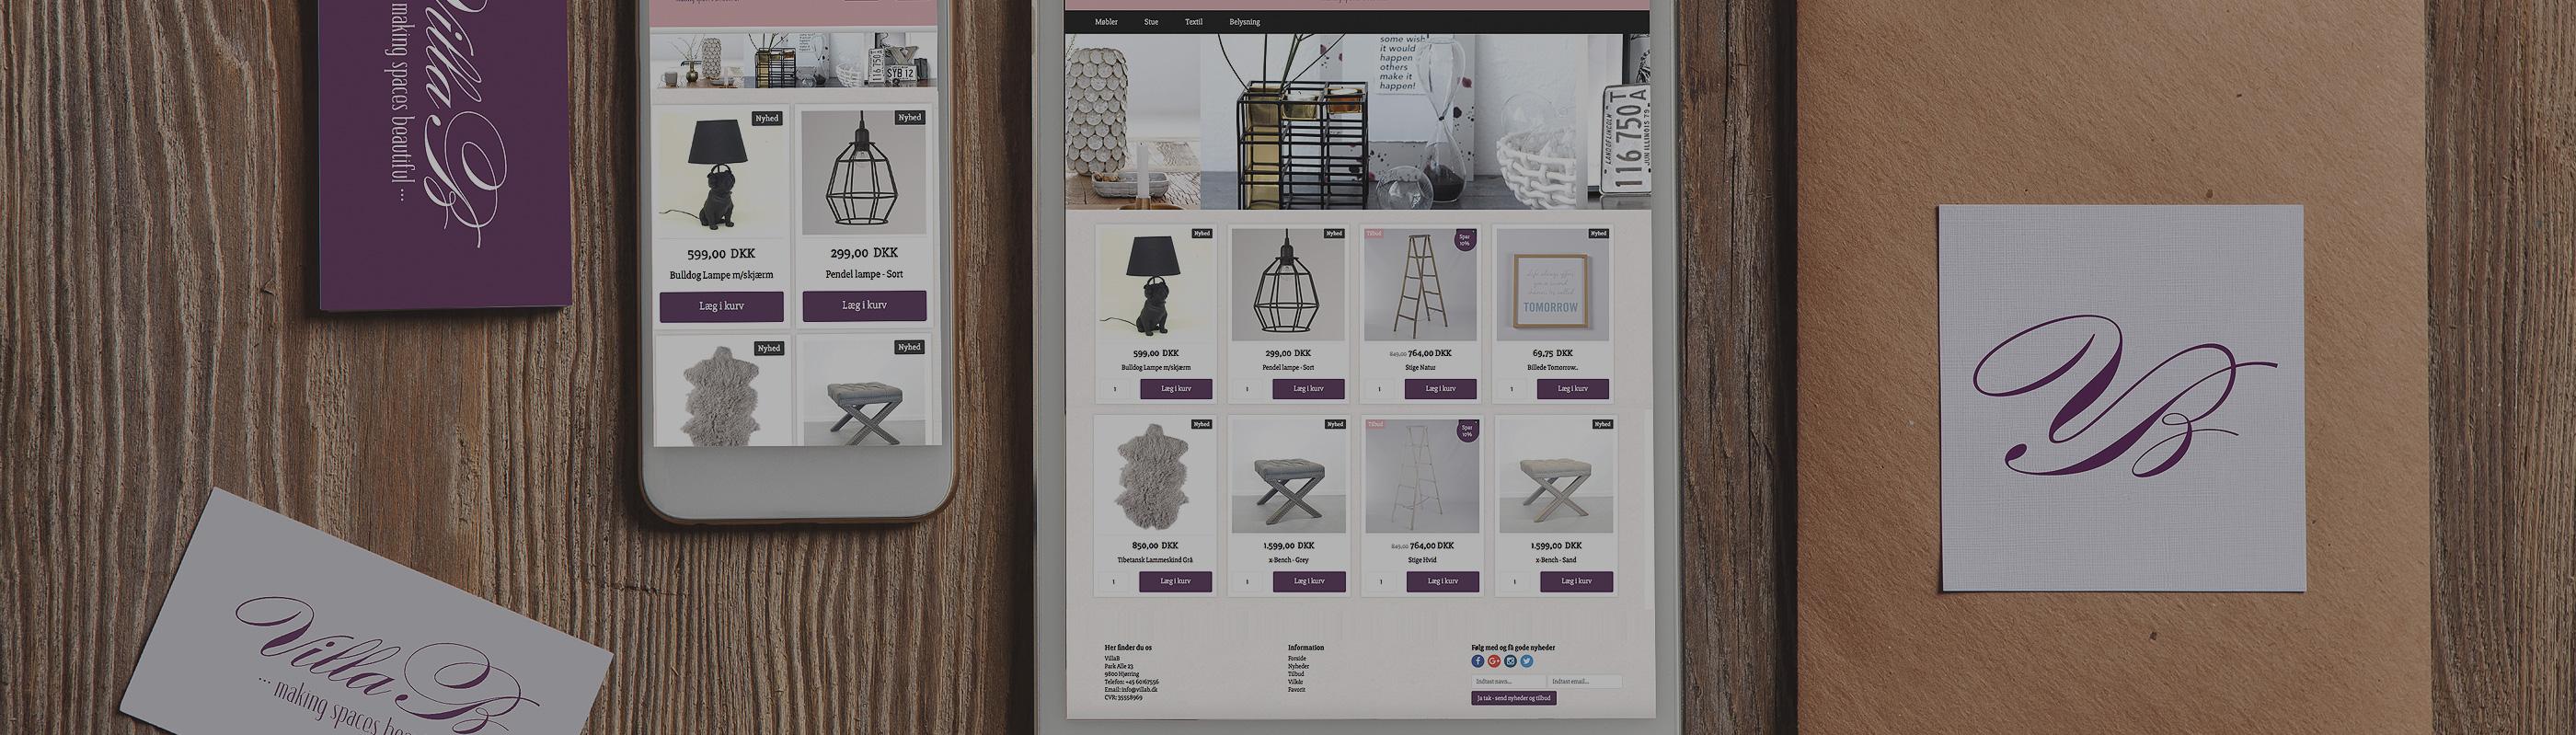 DanDomain webshop design | Responsive DanDomain shop